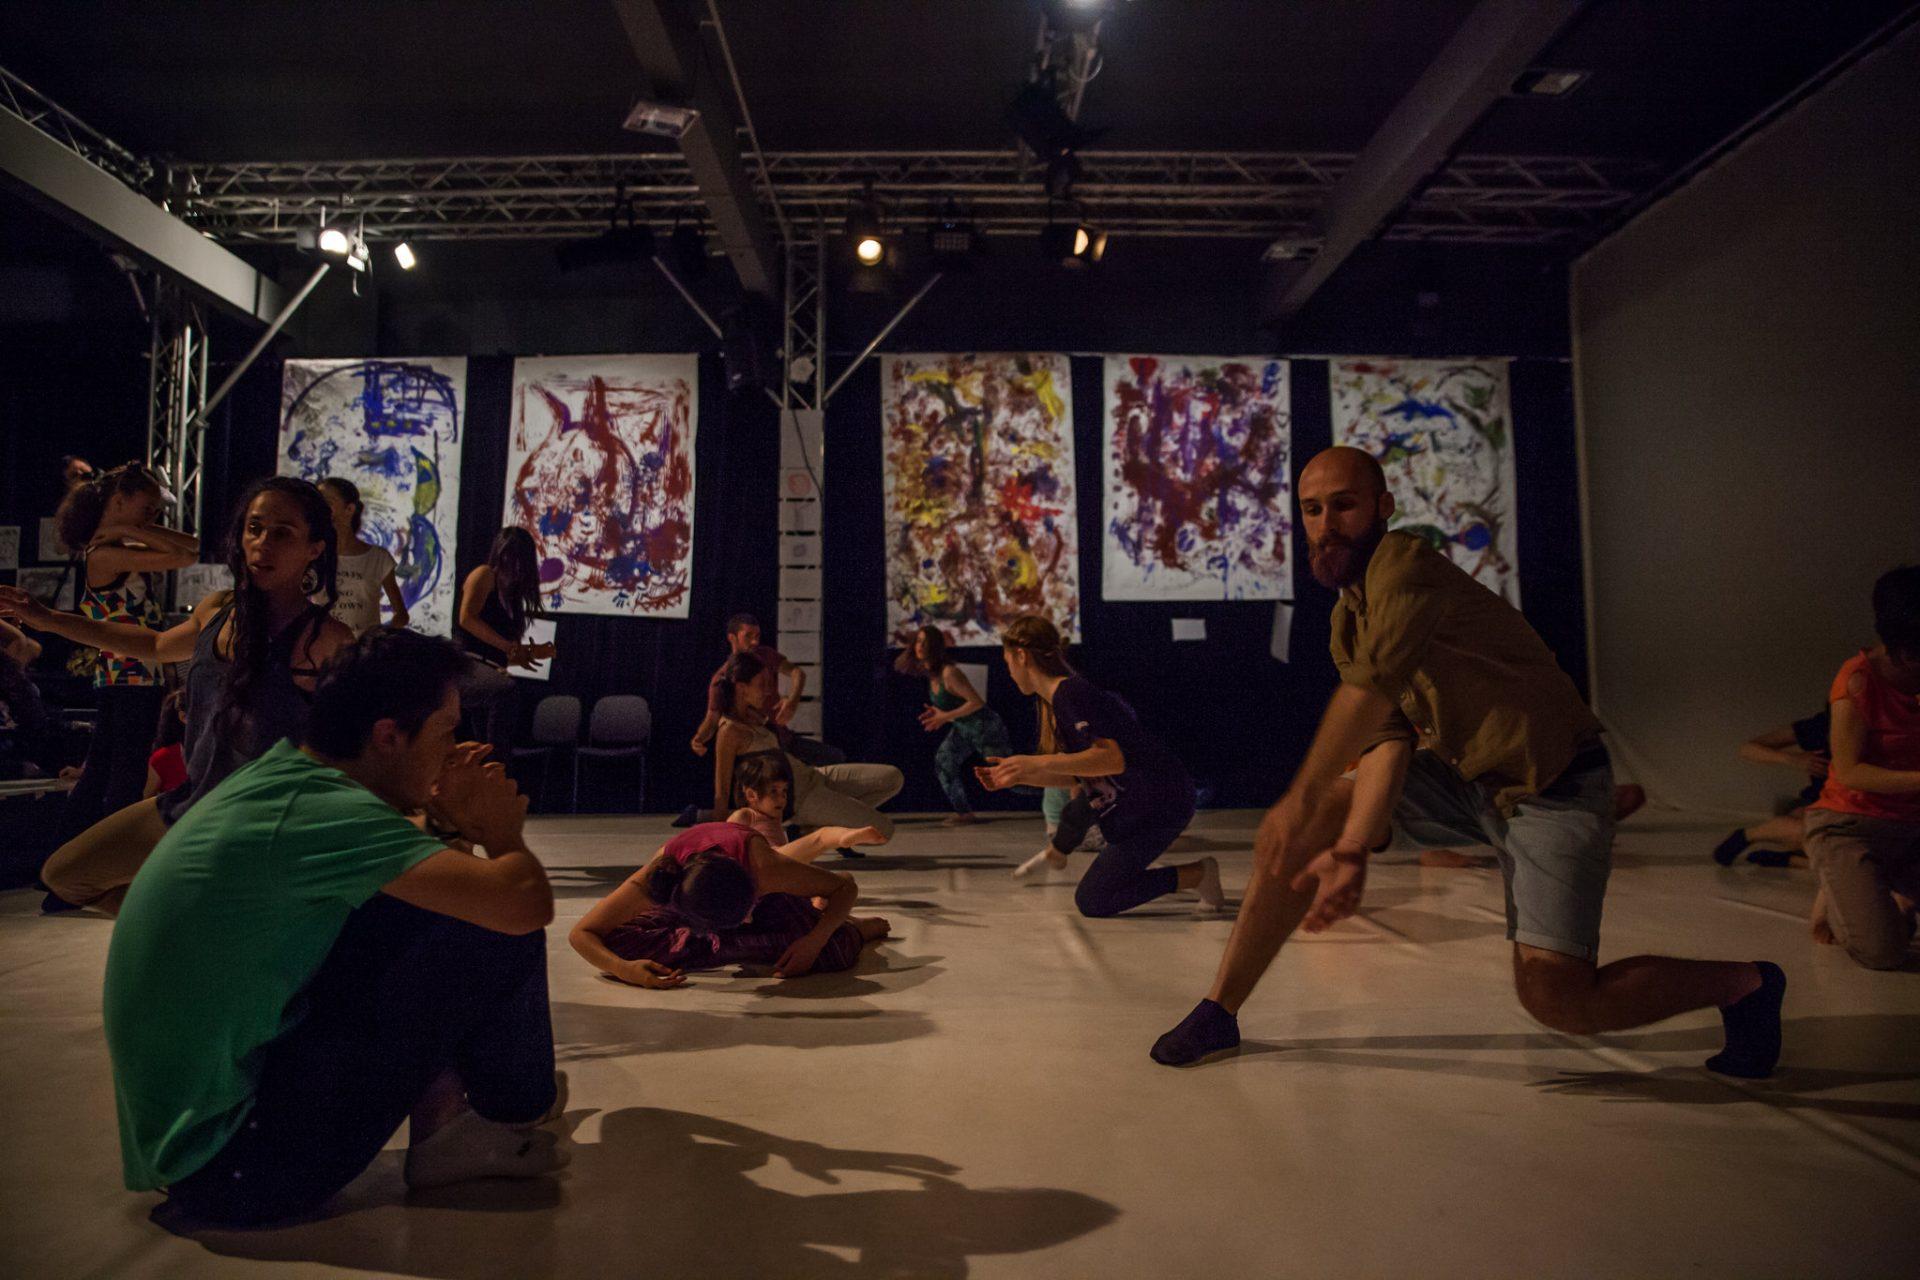 Prezentarea h.e.art - humans embodying art Awareness Through Movement ® in Education